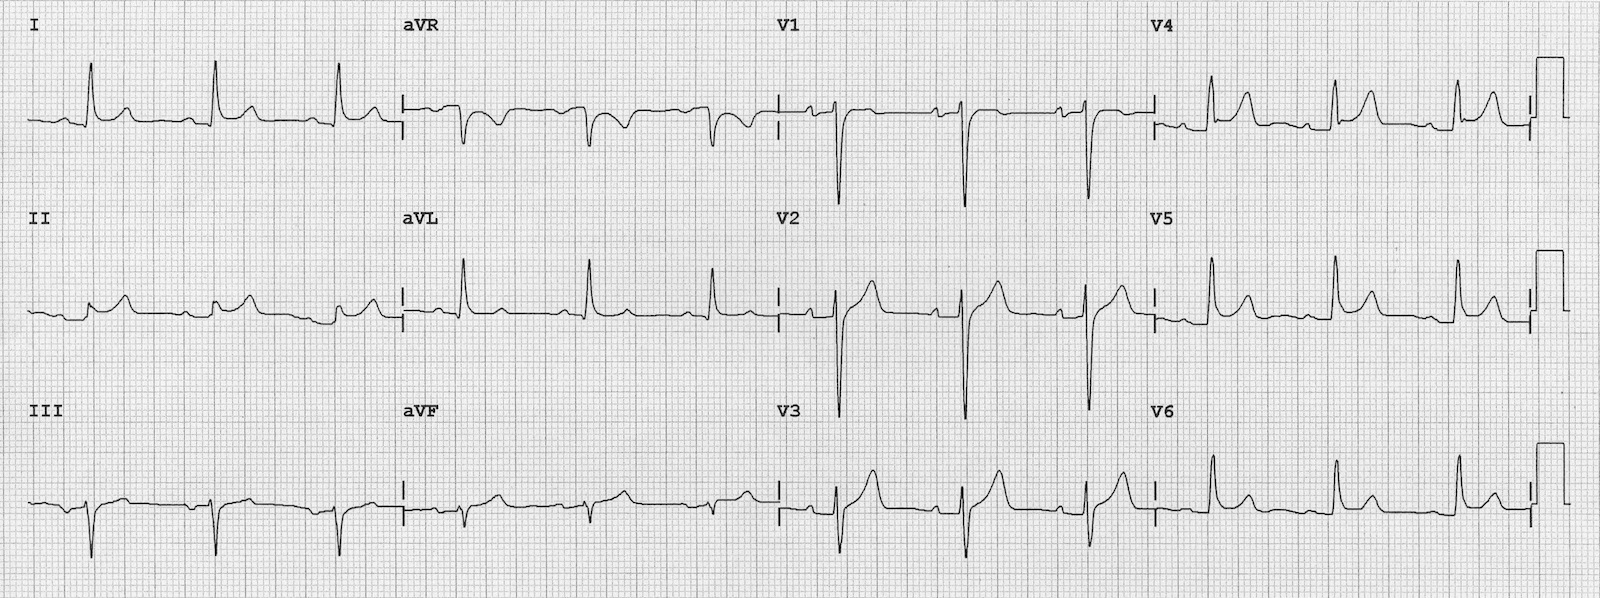 ECG - Question 16 (pericarditis)